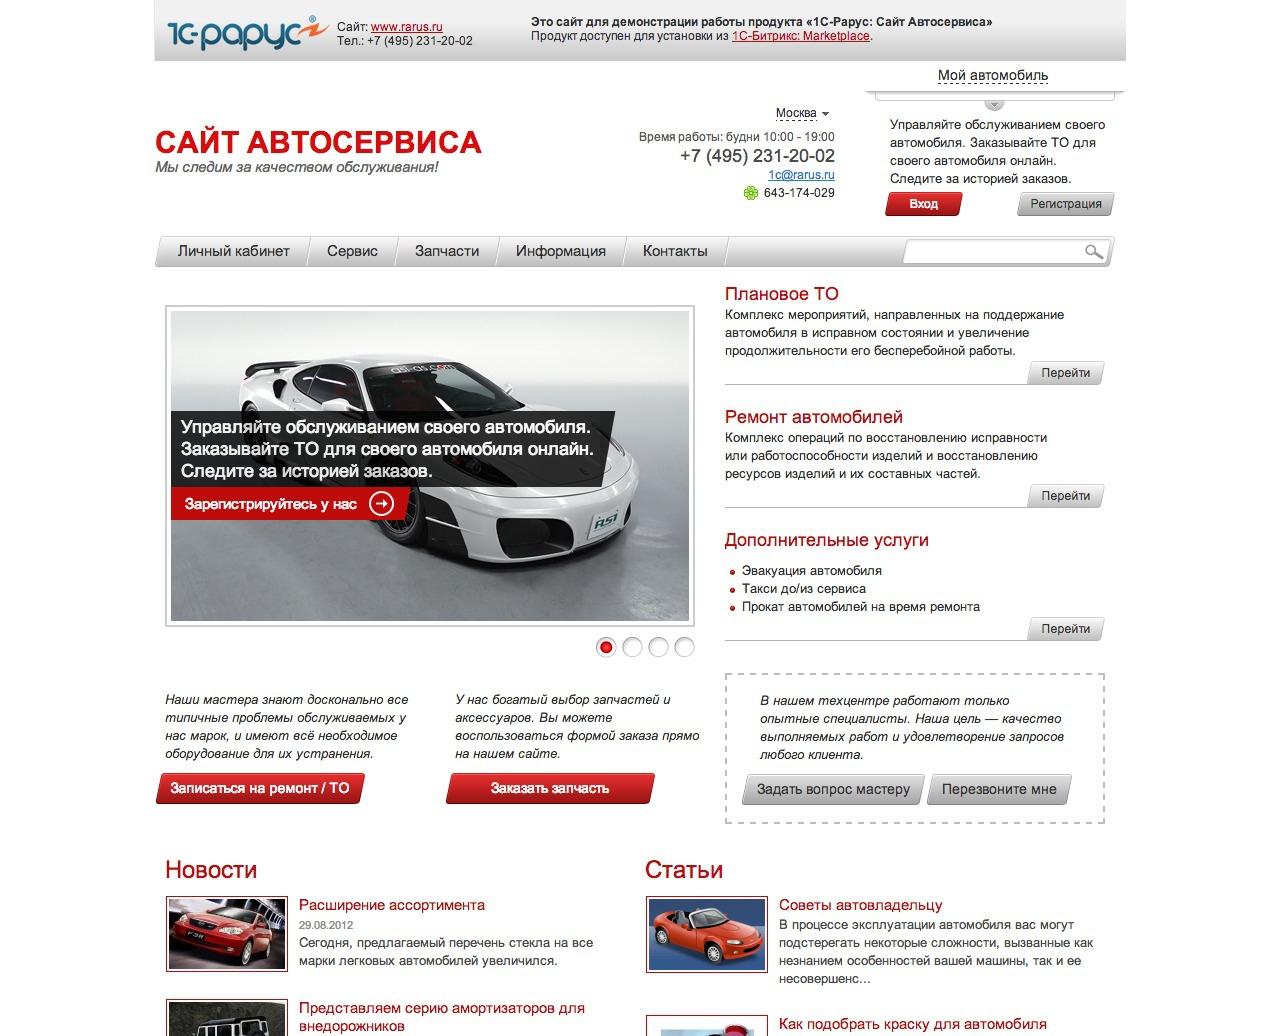 Сайт на продажу – Сайт автосервиса